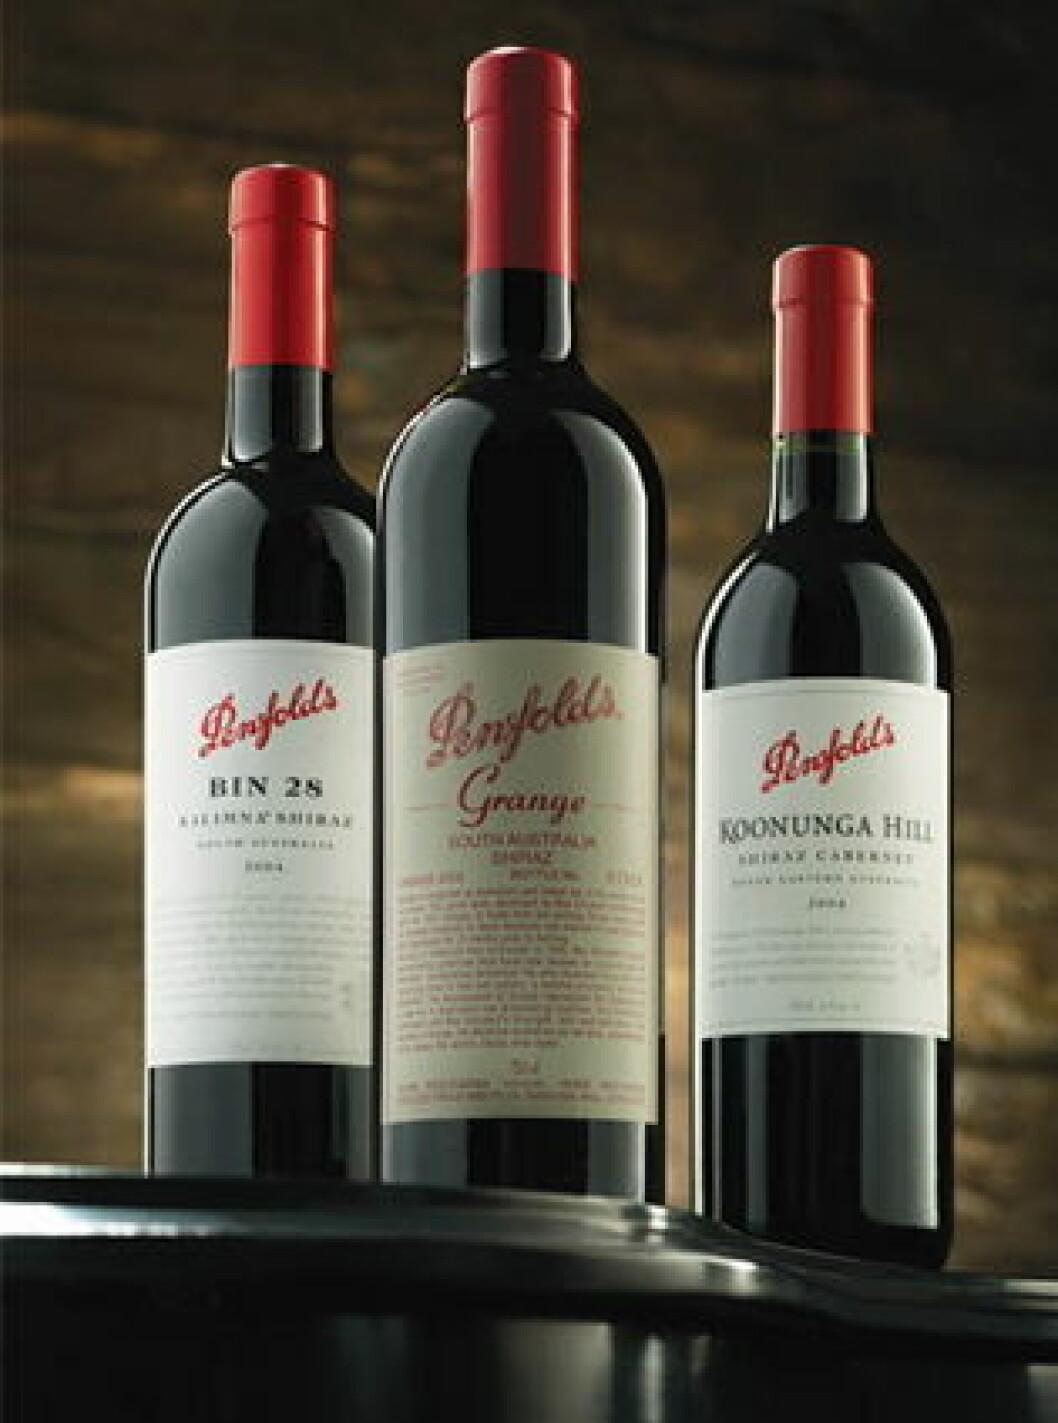 Penfolds L I wines grange